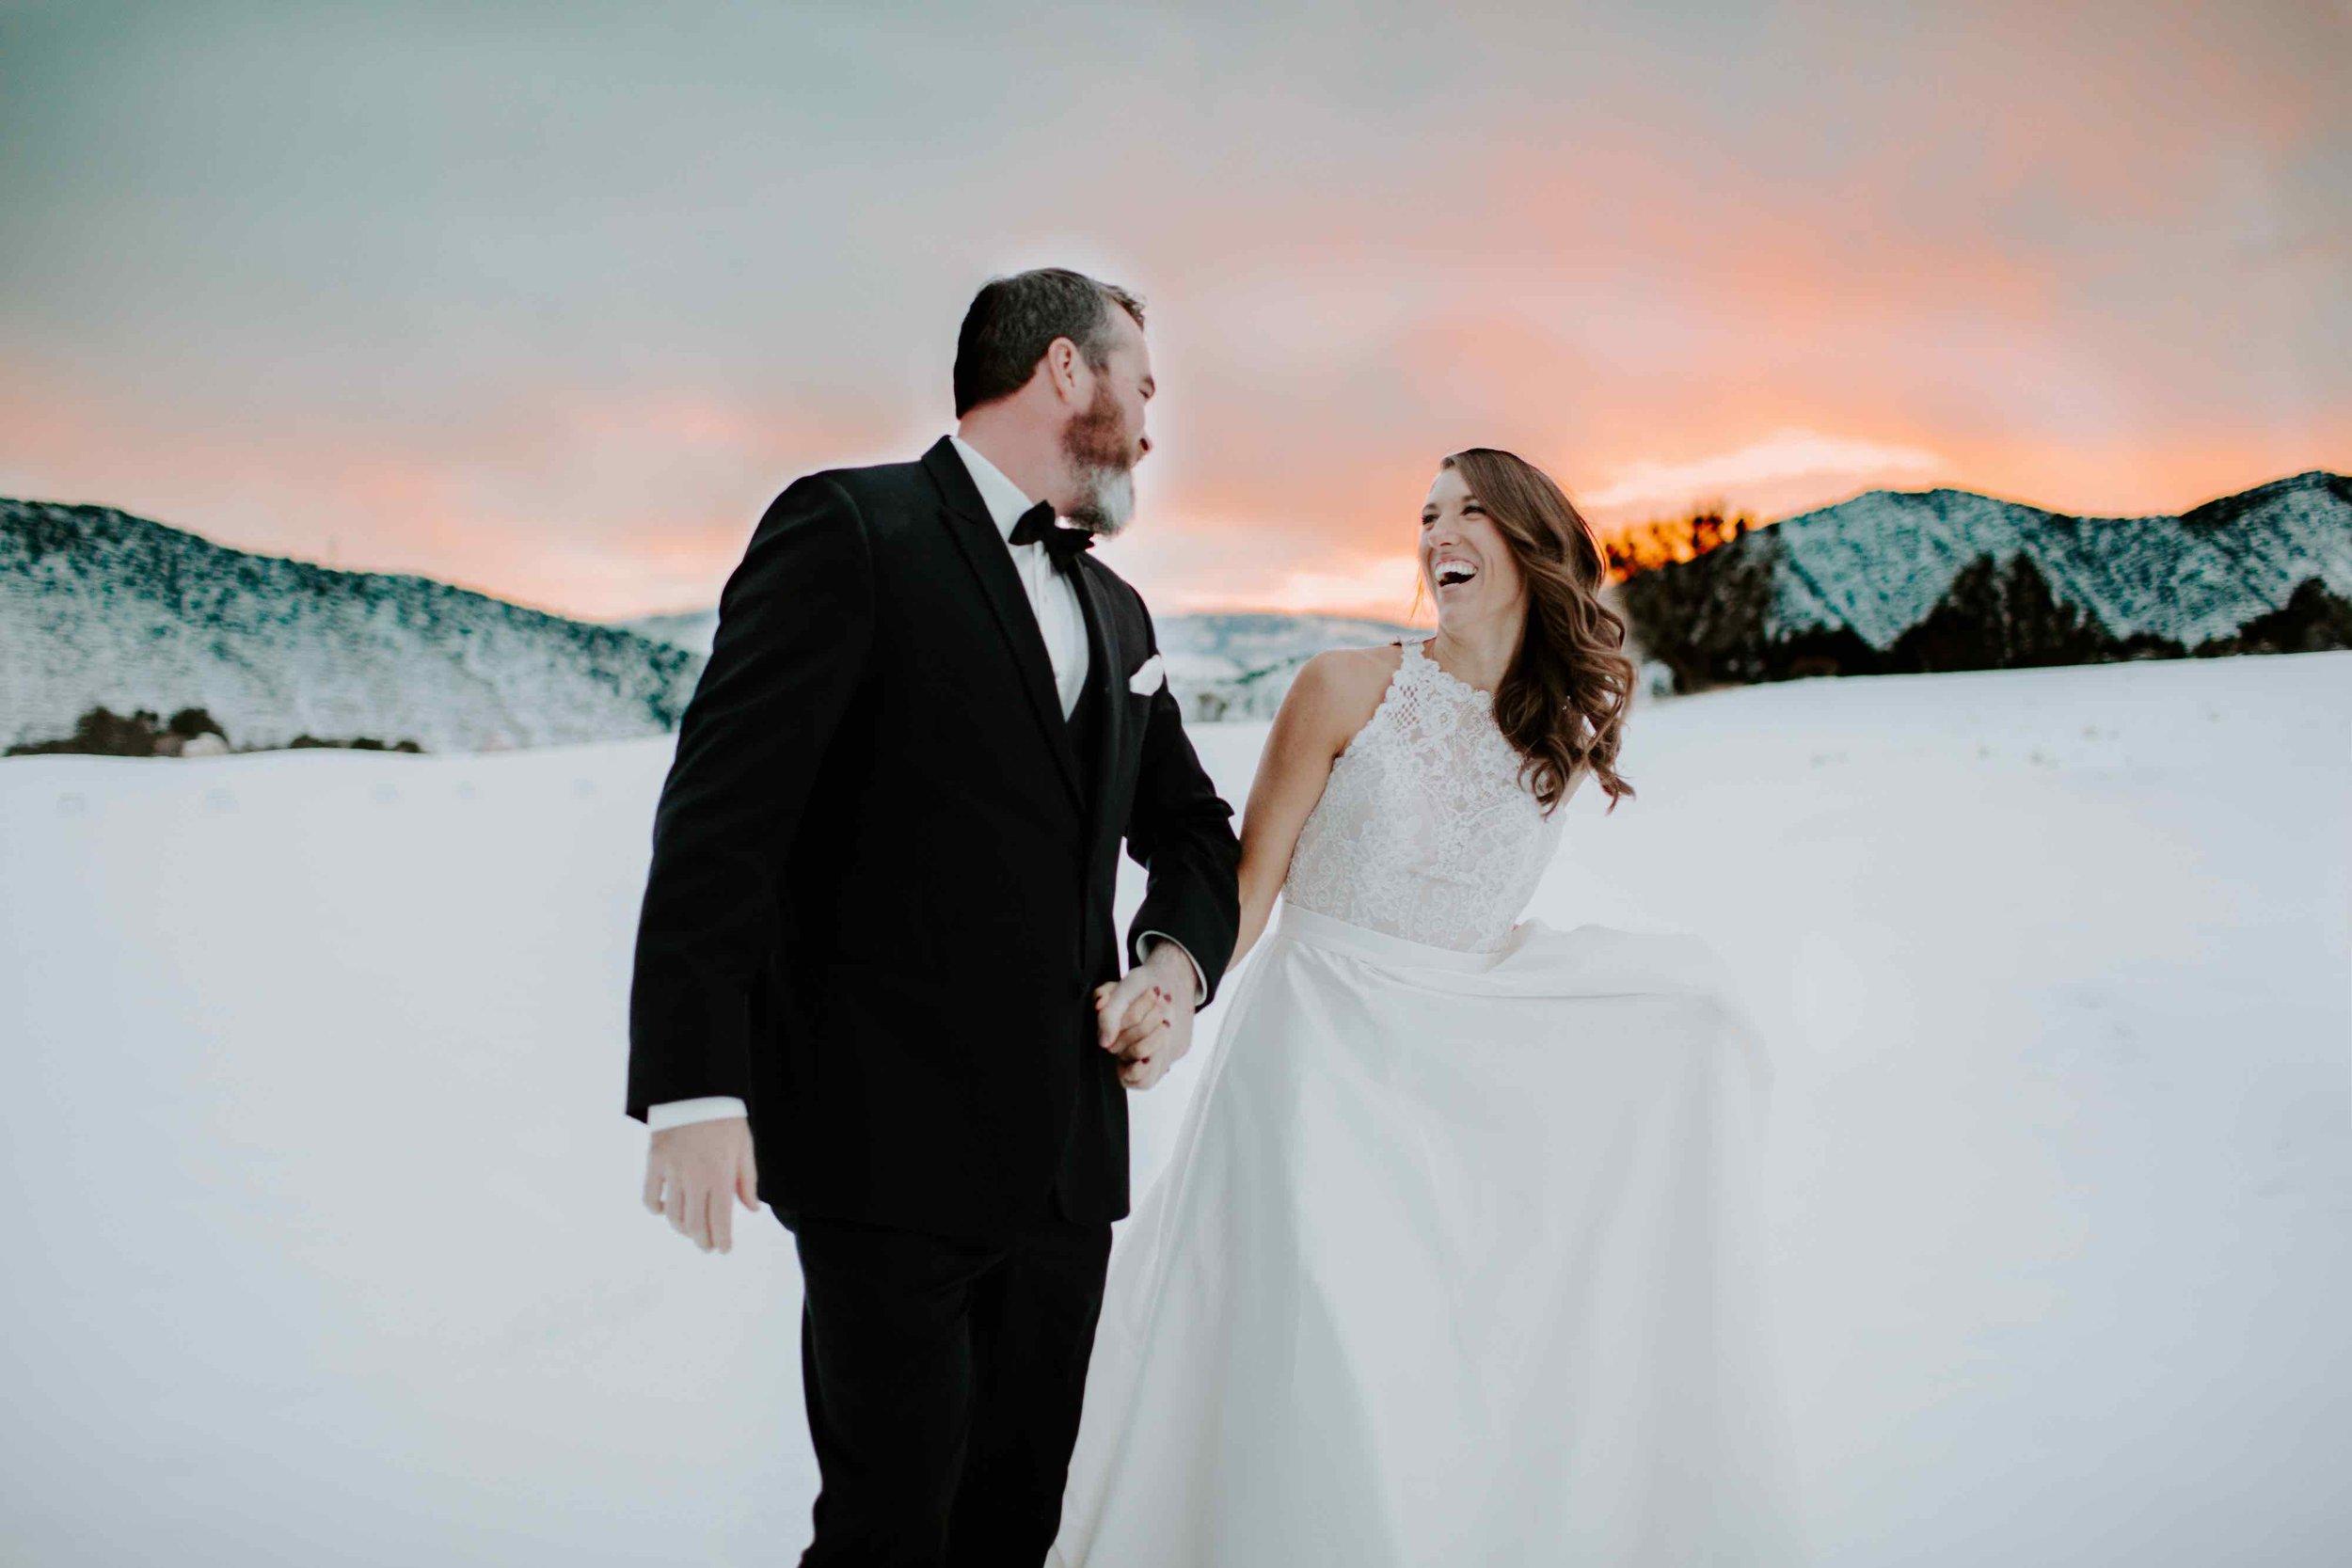 Kisa Conrad Favorites-0047-colorado-wedding-photographer-denver-springs-vailhotel-glenwood-springs-colorado-wedding-photographer.jpeg